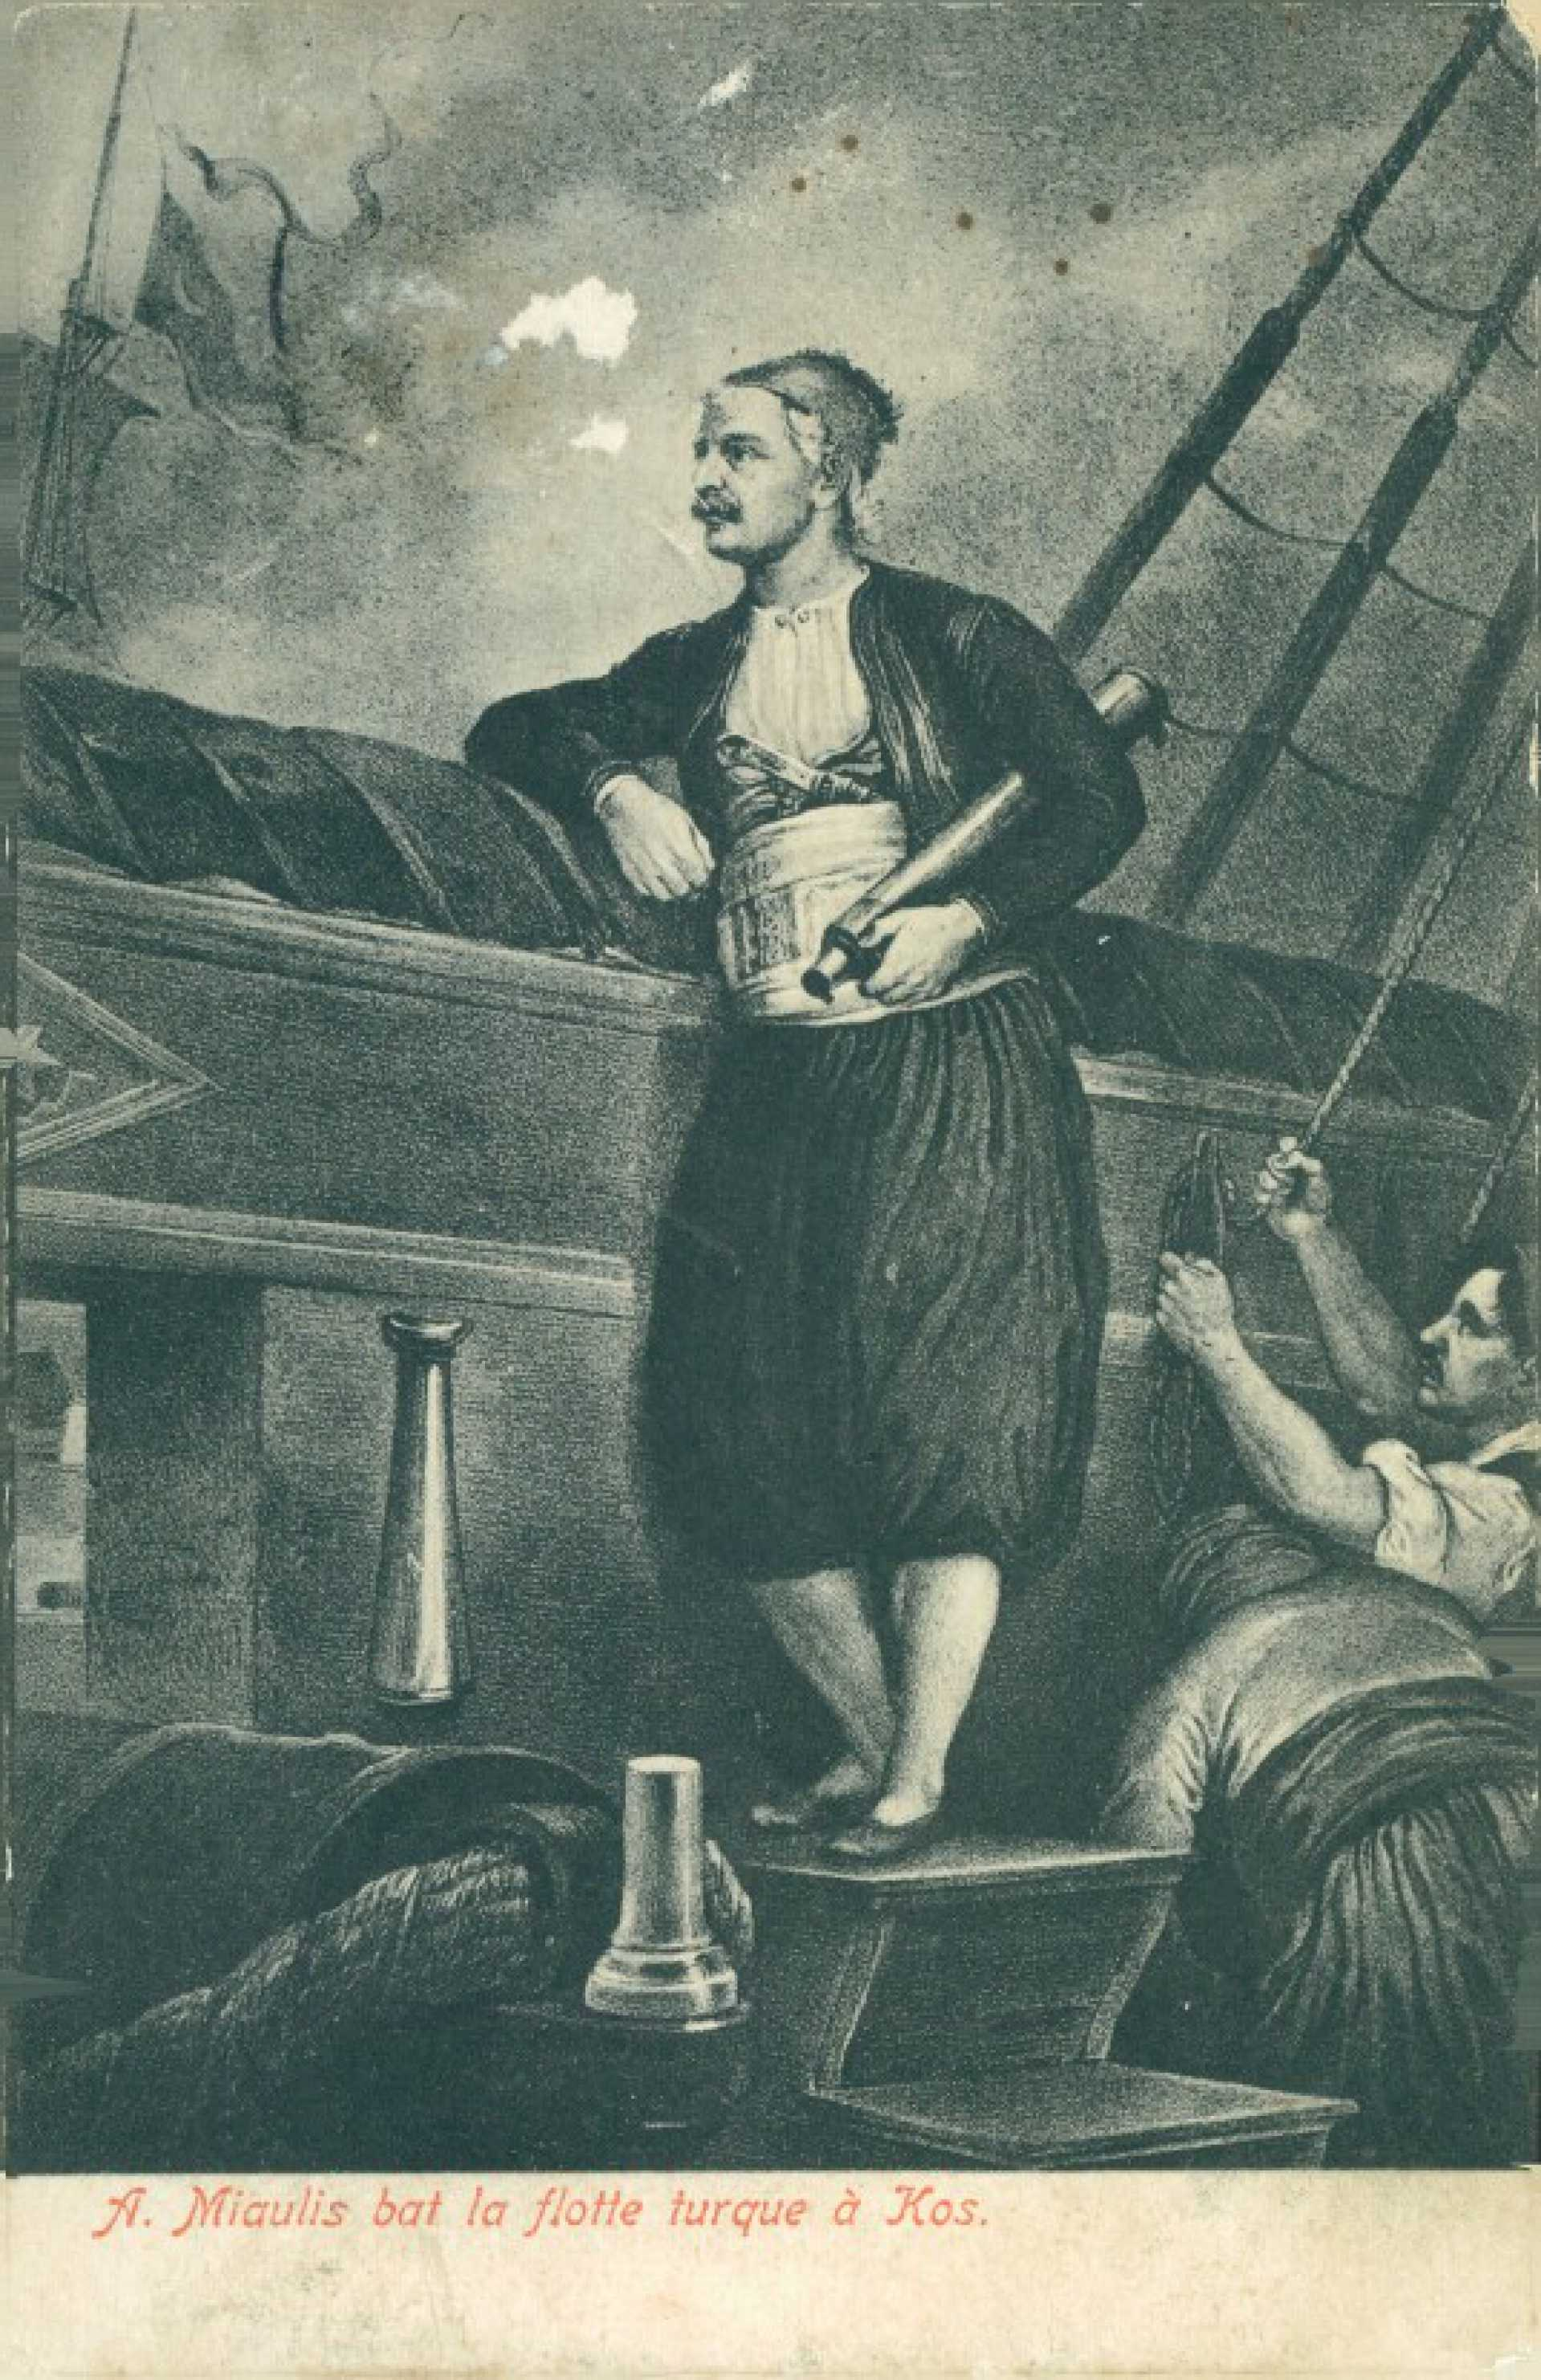 A. Miaulis bat la flotte turque a Kos